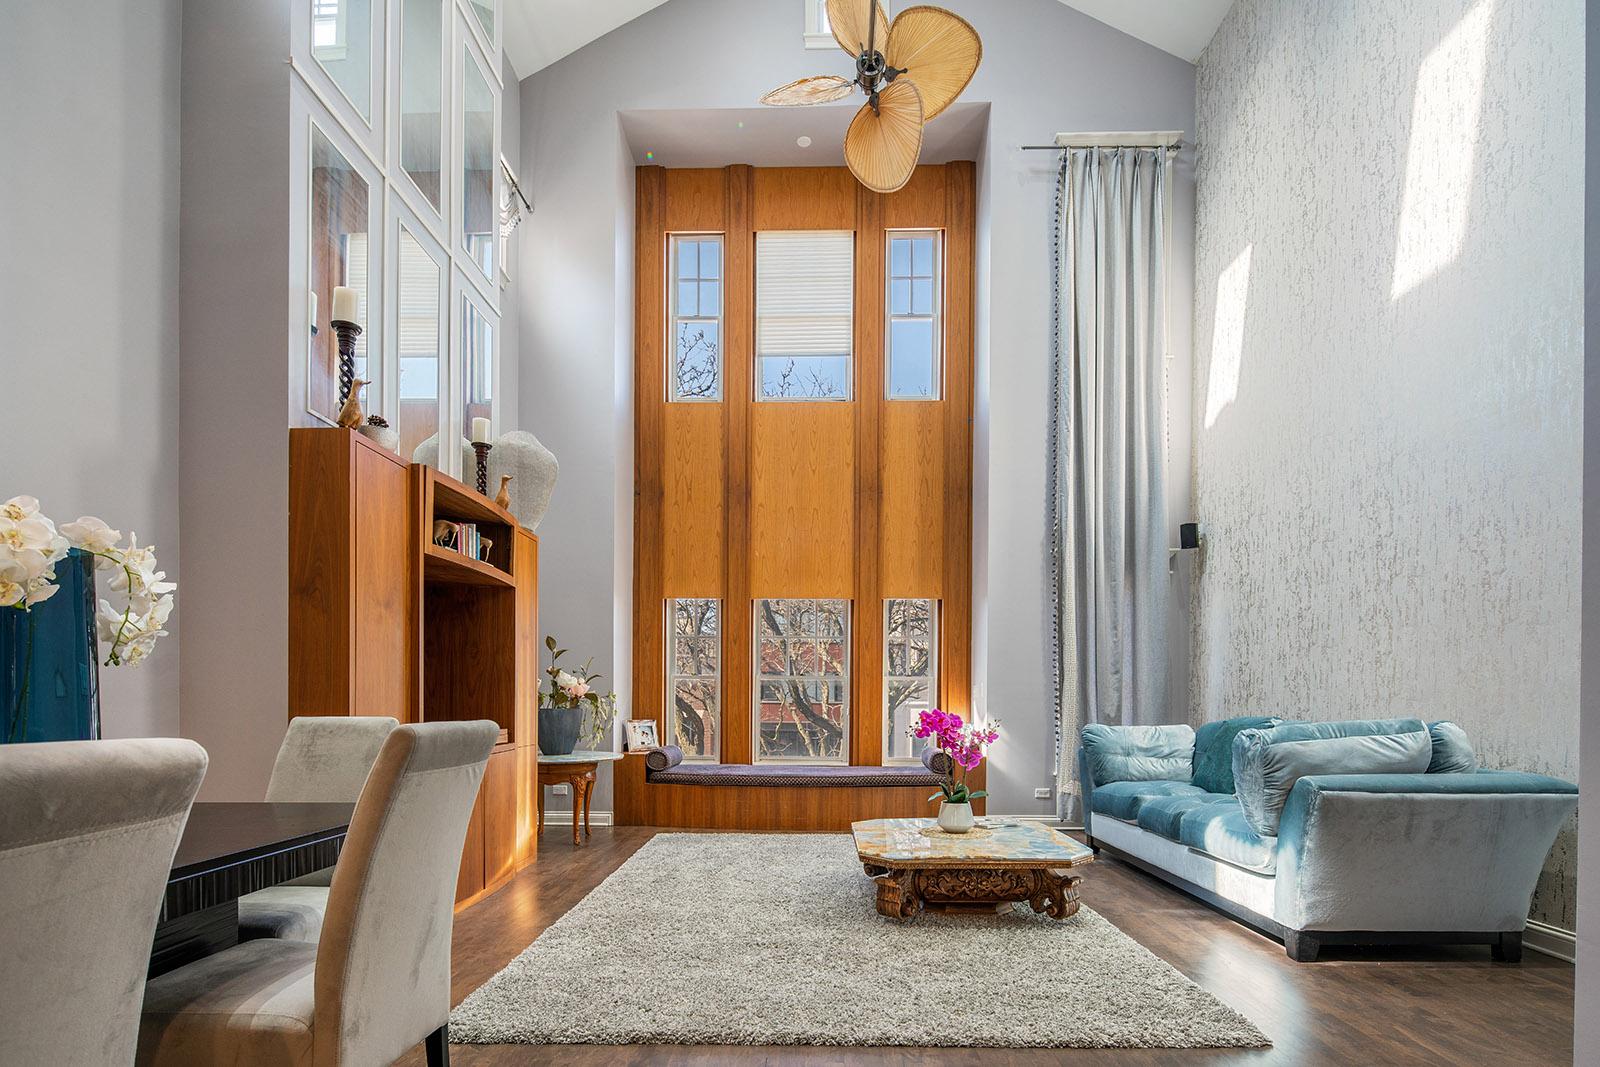 An organized Chicago home